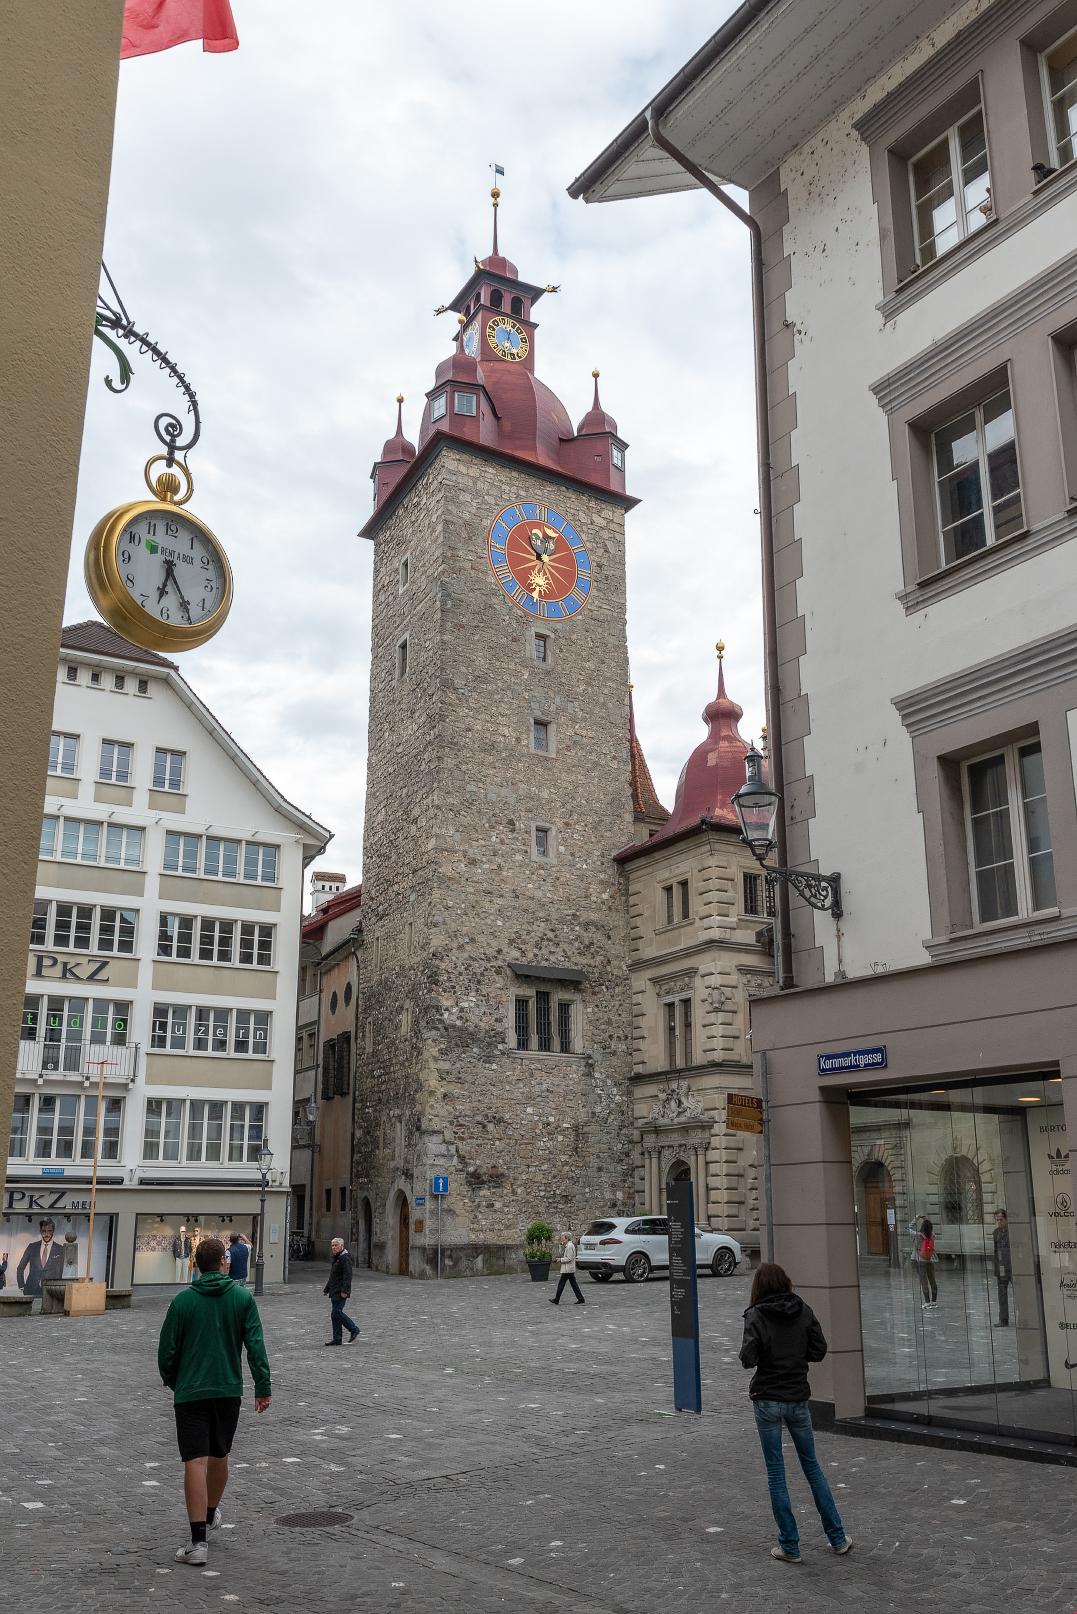 Altes Luzerner Rathaus (Town Hall)